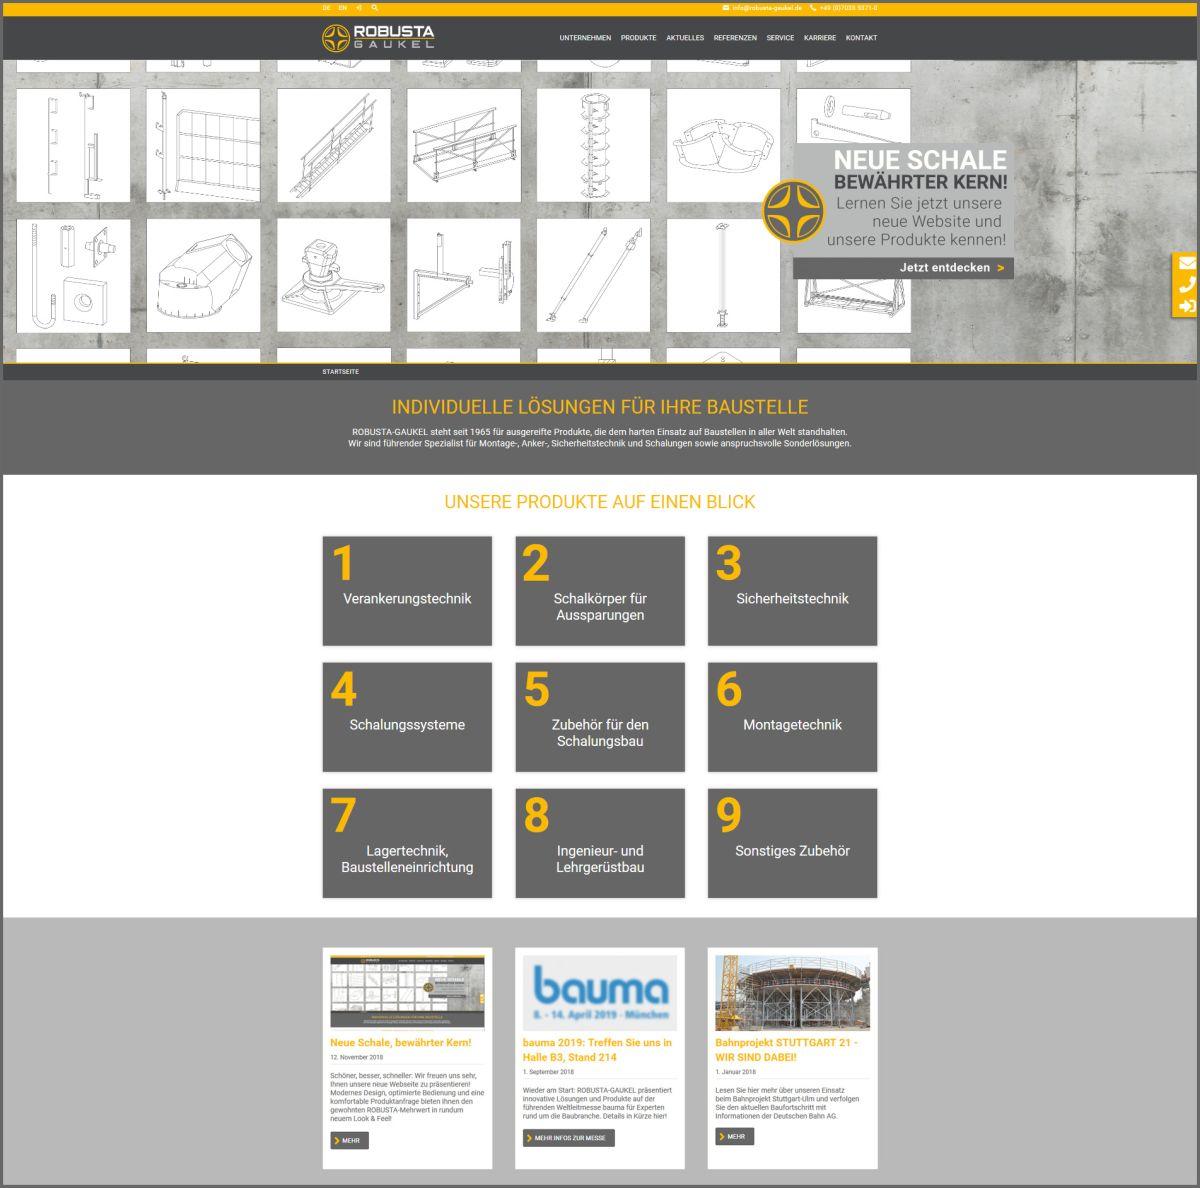 Robusta-Gaukel neue Website